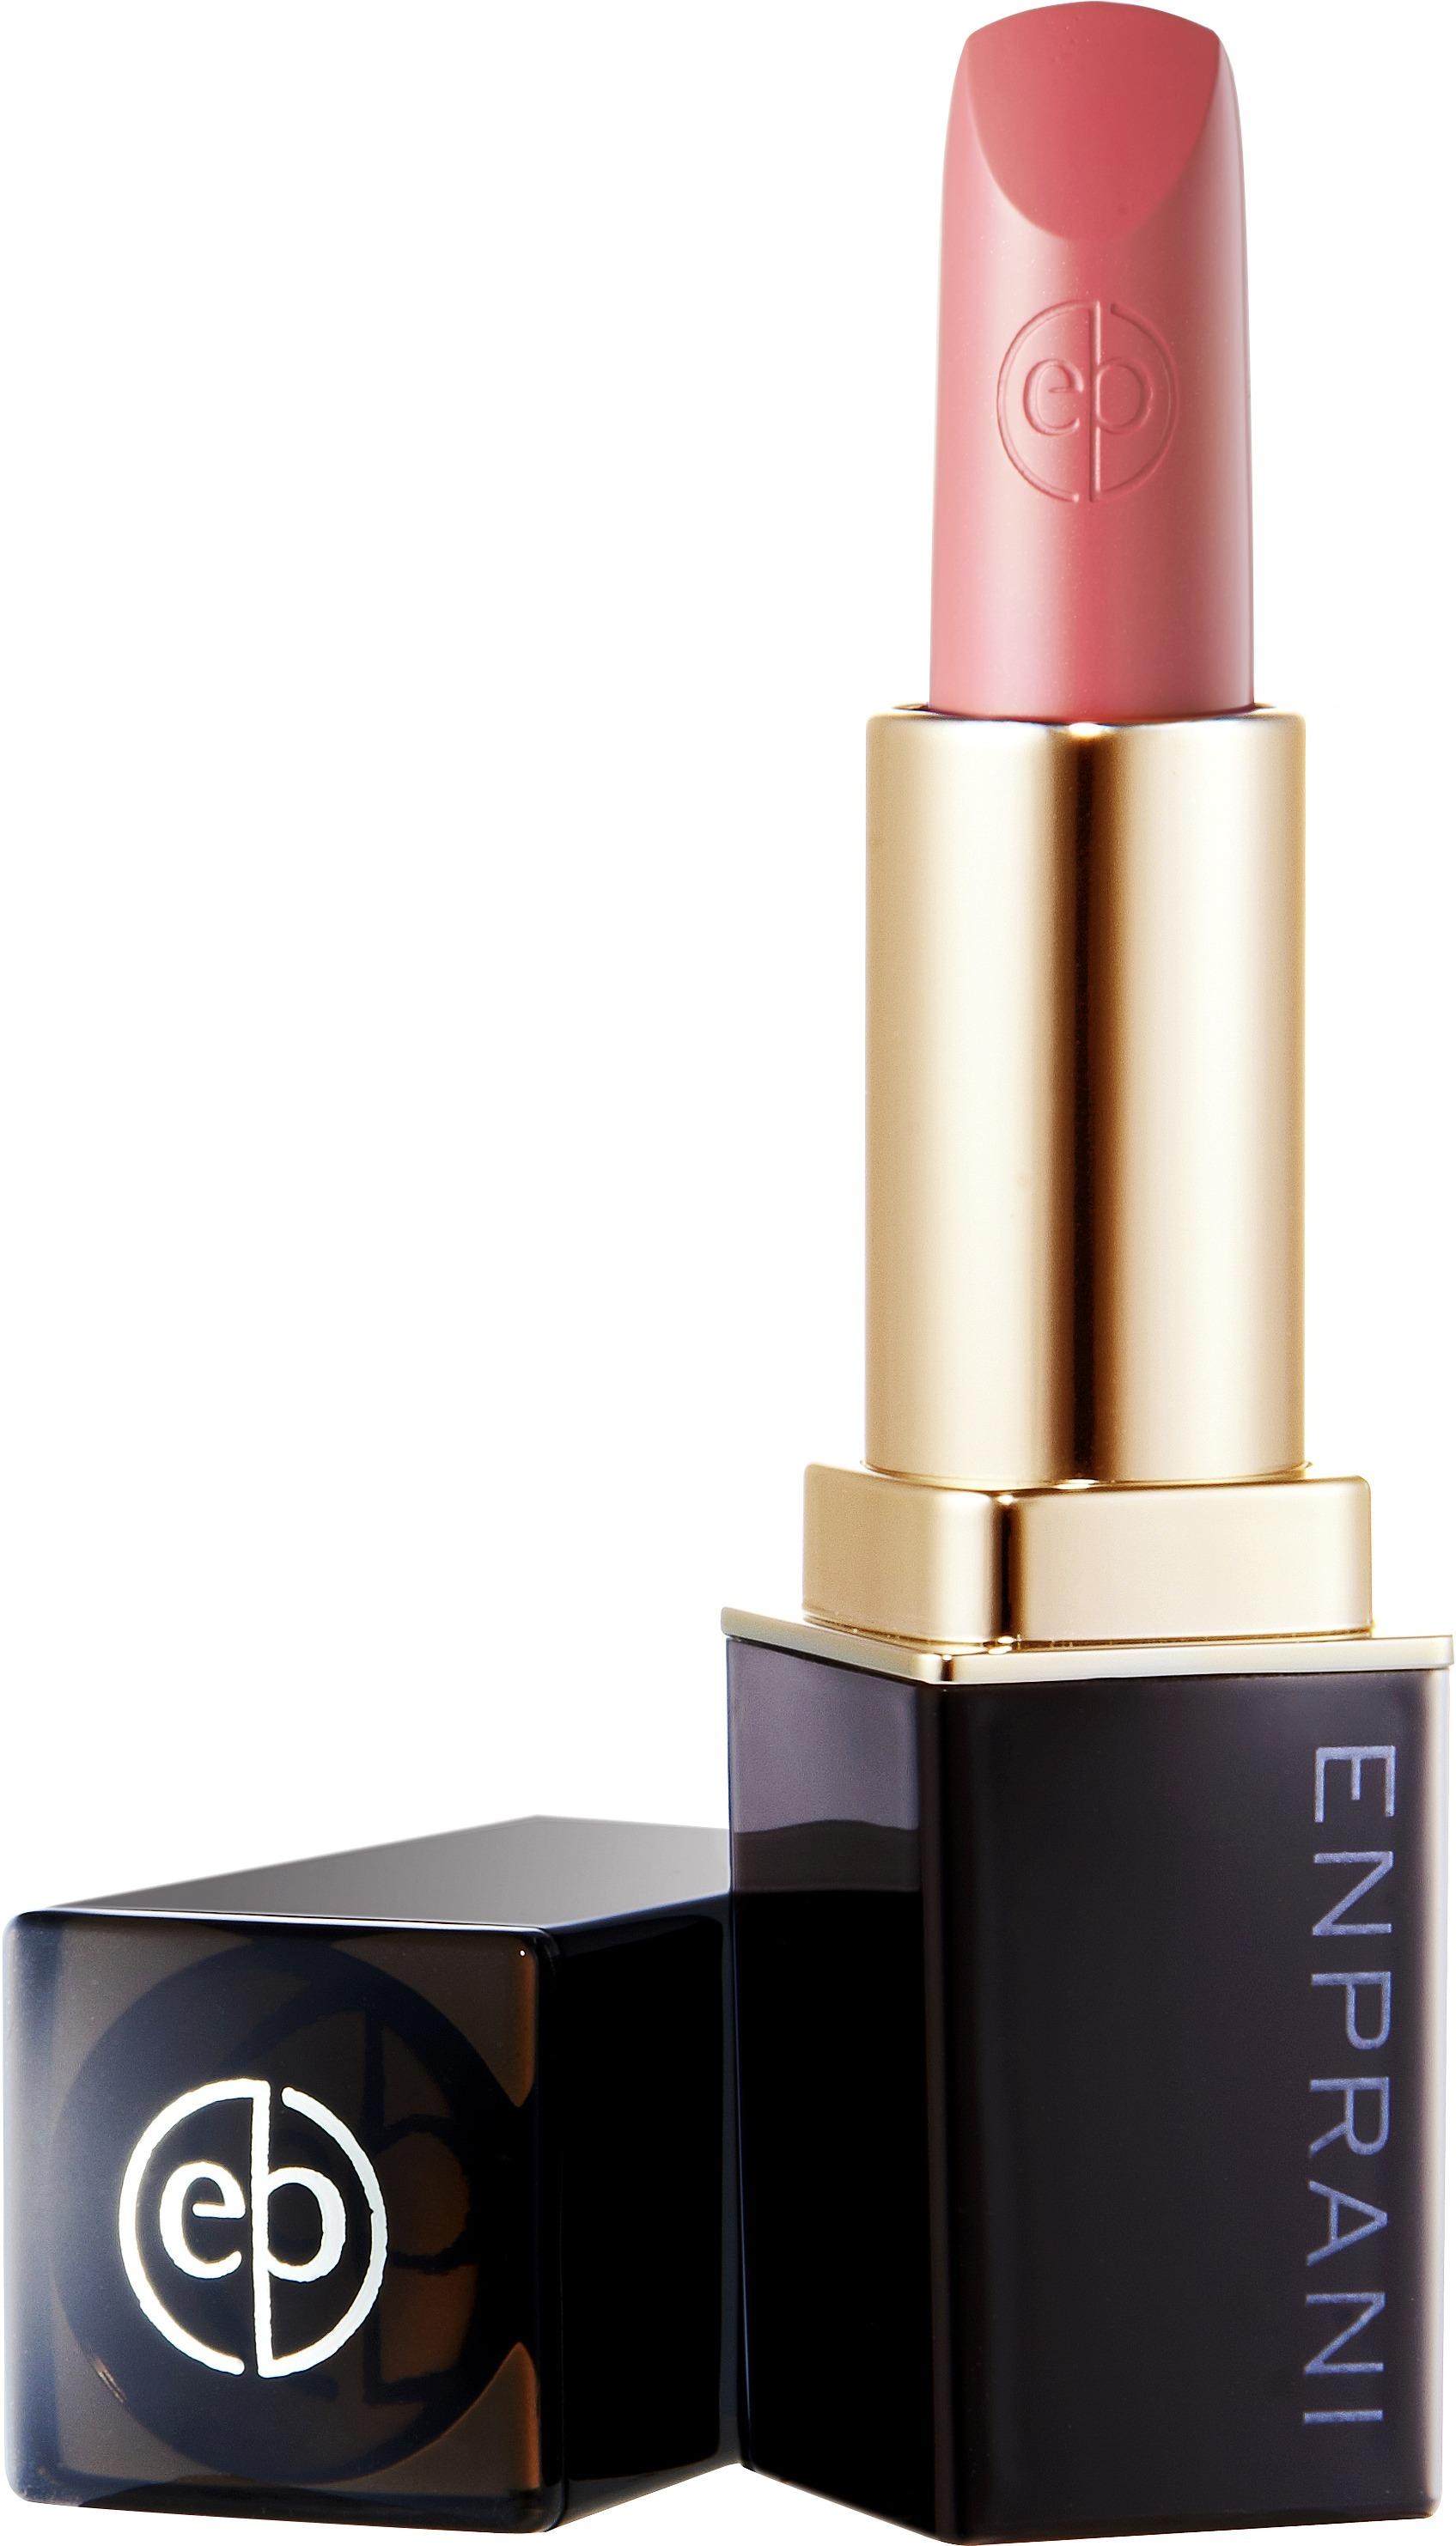 Enprani Delicate Luminous Lipstick фото